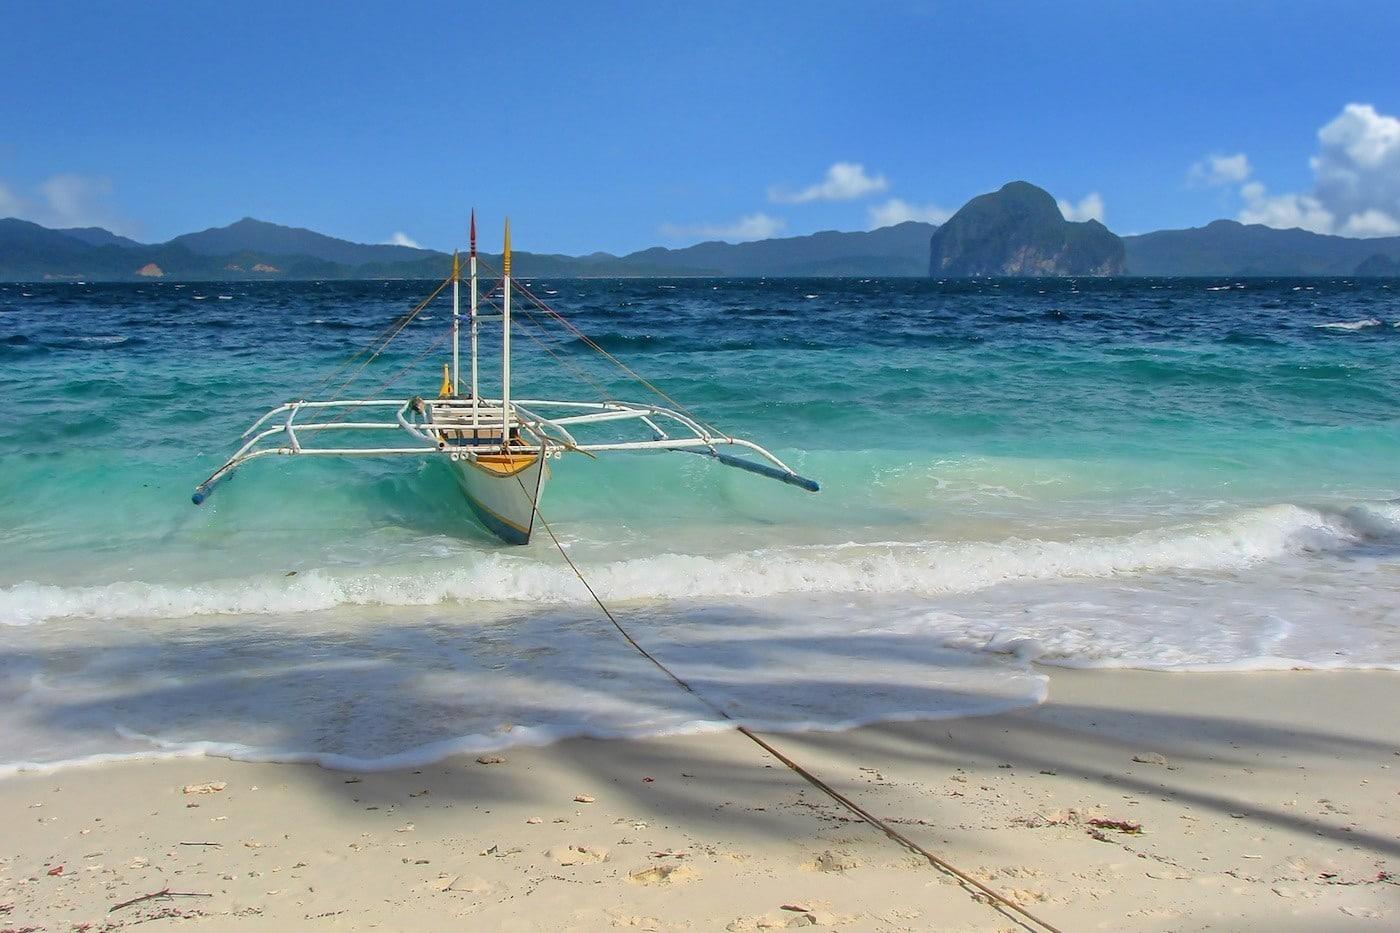 Entalula Beach in El Nido, Palawan